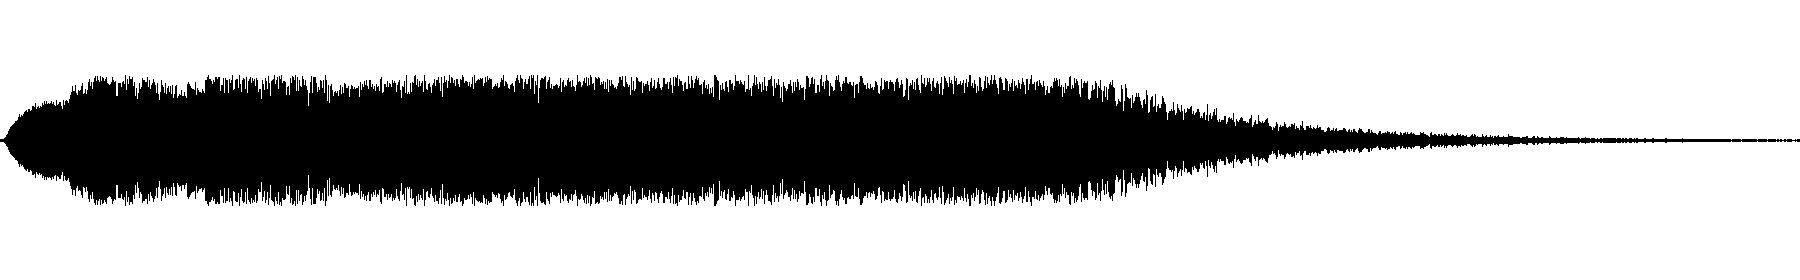 20170119 02 130bpm amin   spheres 002